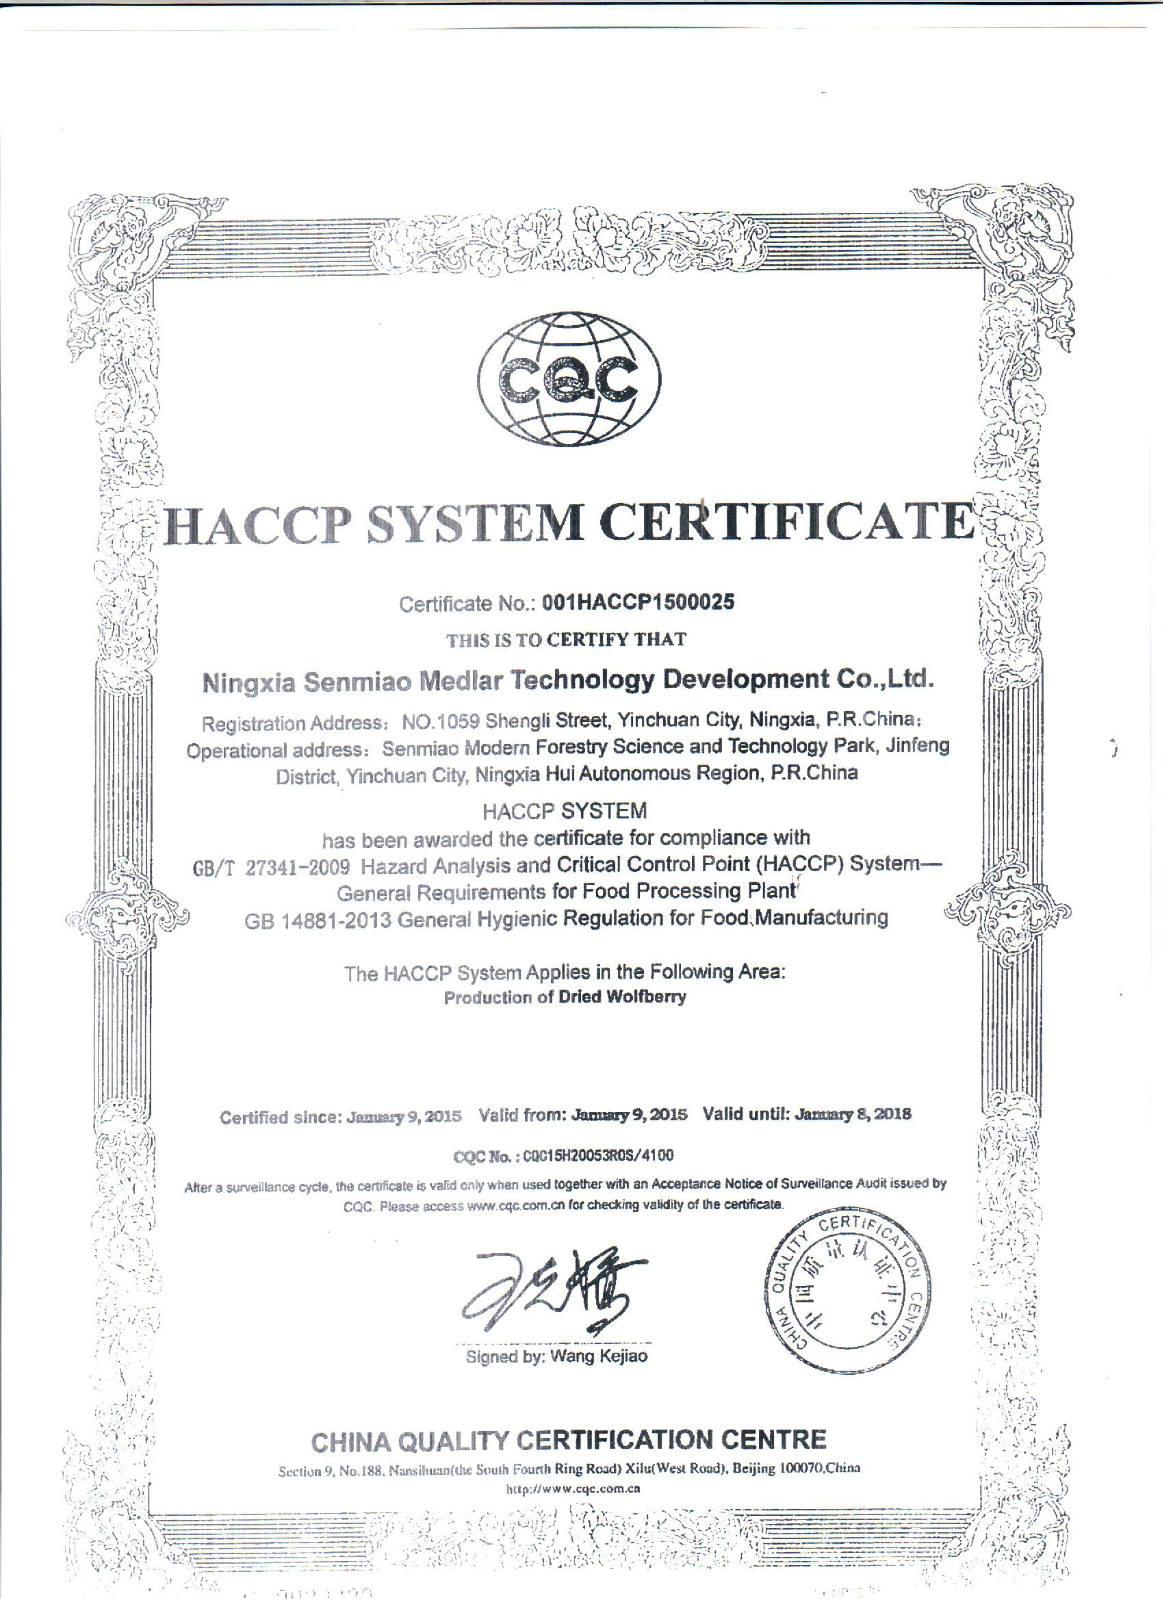 HACCP SYSTEM CERTIFICATE